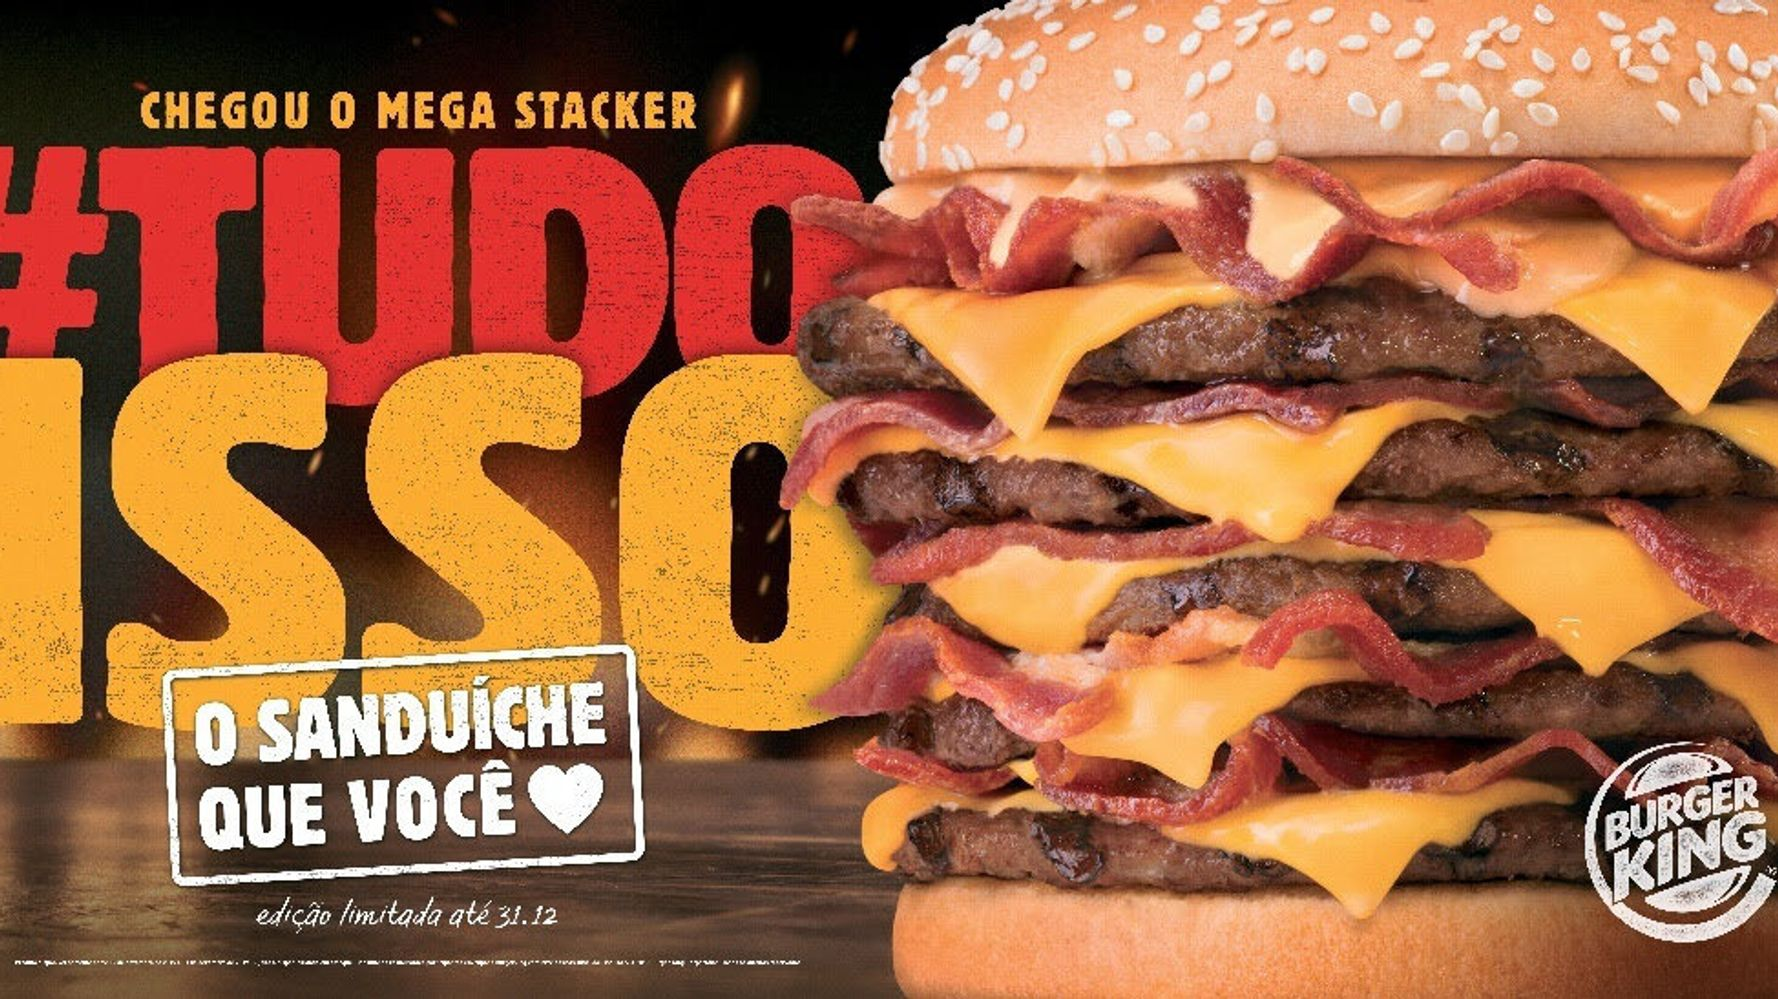 calorias de um lanche do burger king